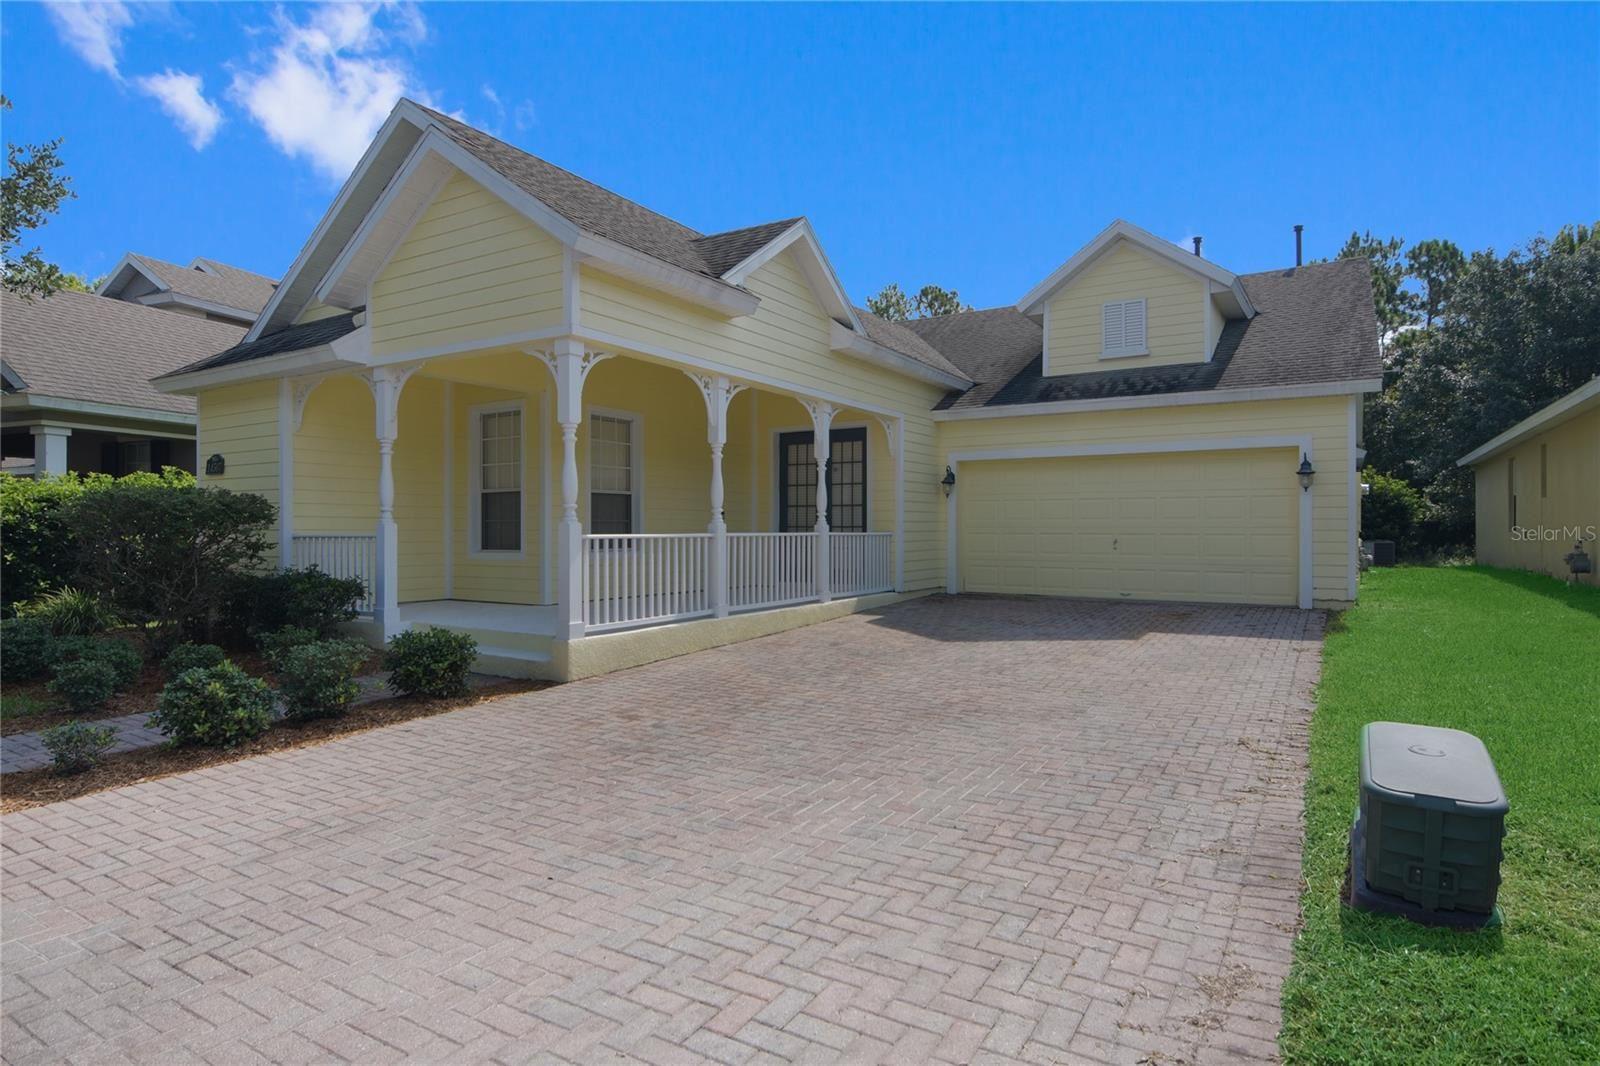 14507 WHITTRIDGE DRIVE, Winter Garden, FL 34787 - #: O5962067